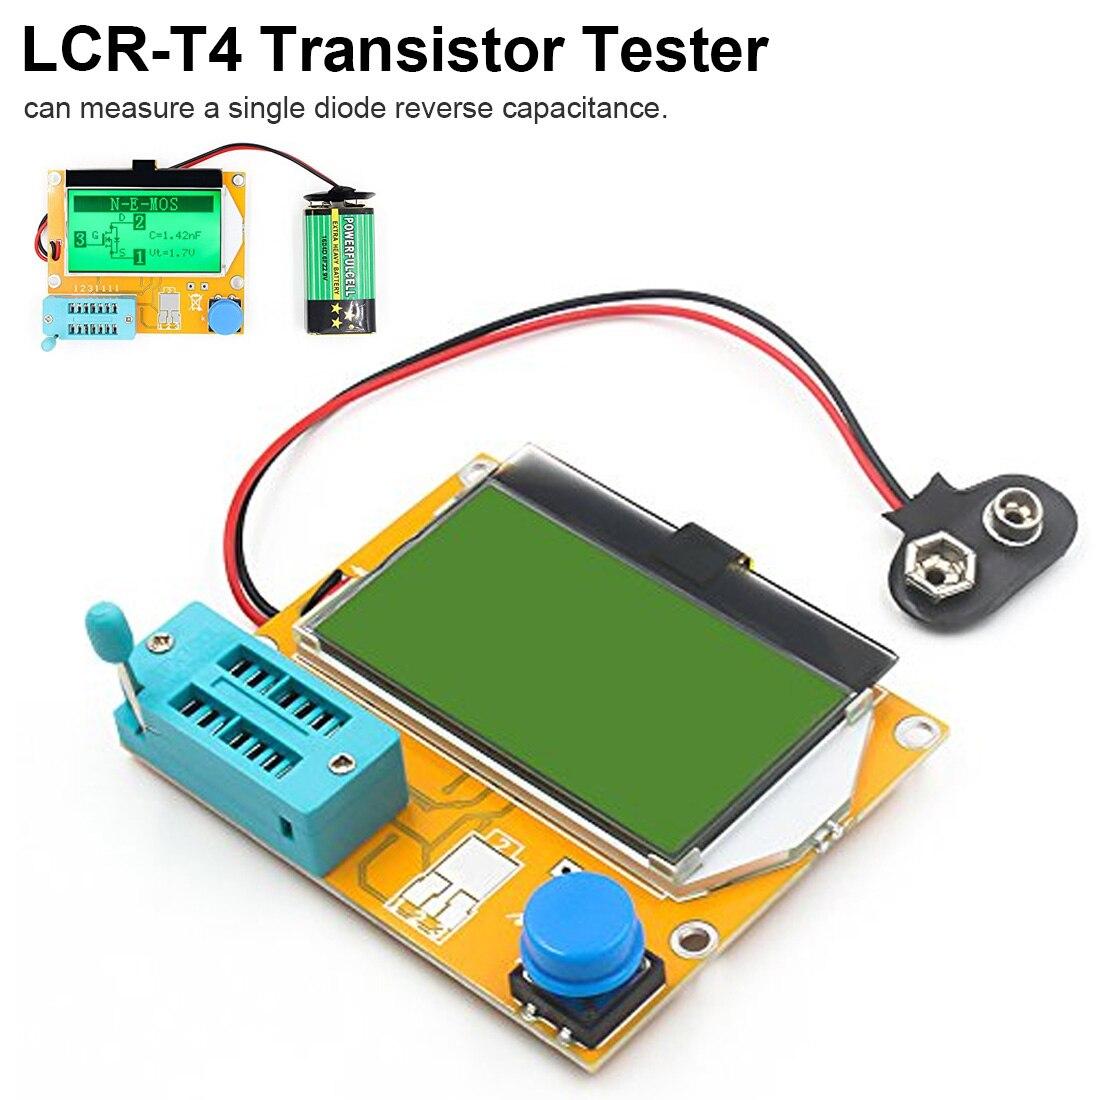 ESR-T4 Meter Transistor Tester Digital LCR Mega328 V2.68 ESR Diode Triode Capacitance MOS/PNP/NPN LCR 12864 LCD Screen Tester 20pcs sp8m3 lcd high pressure plate mos transistor